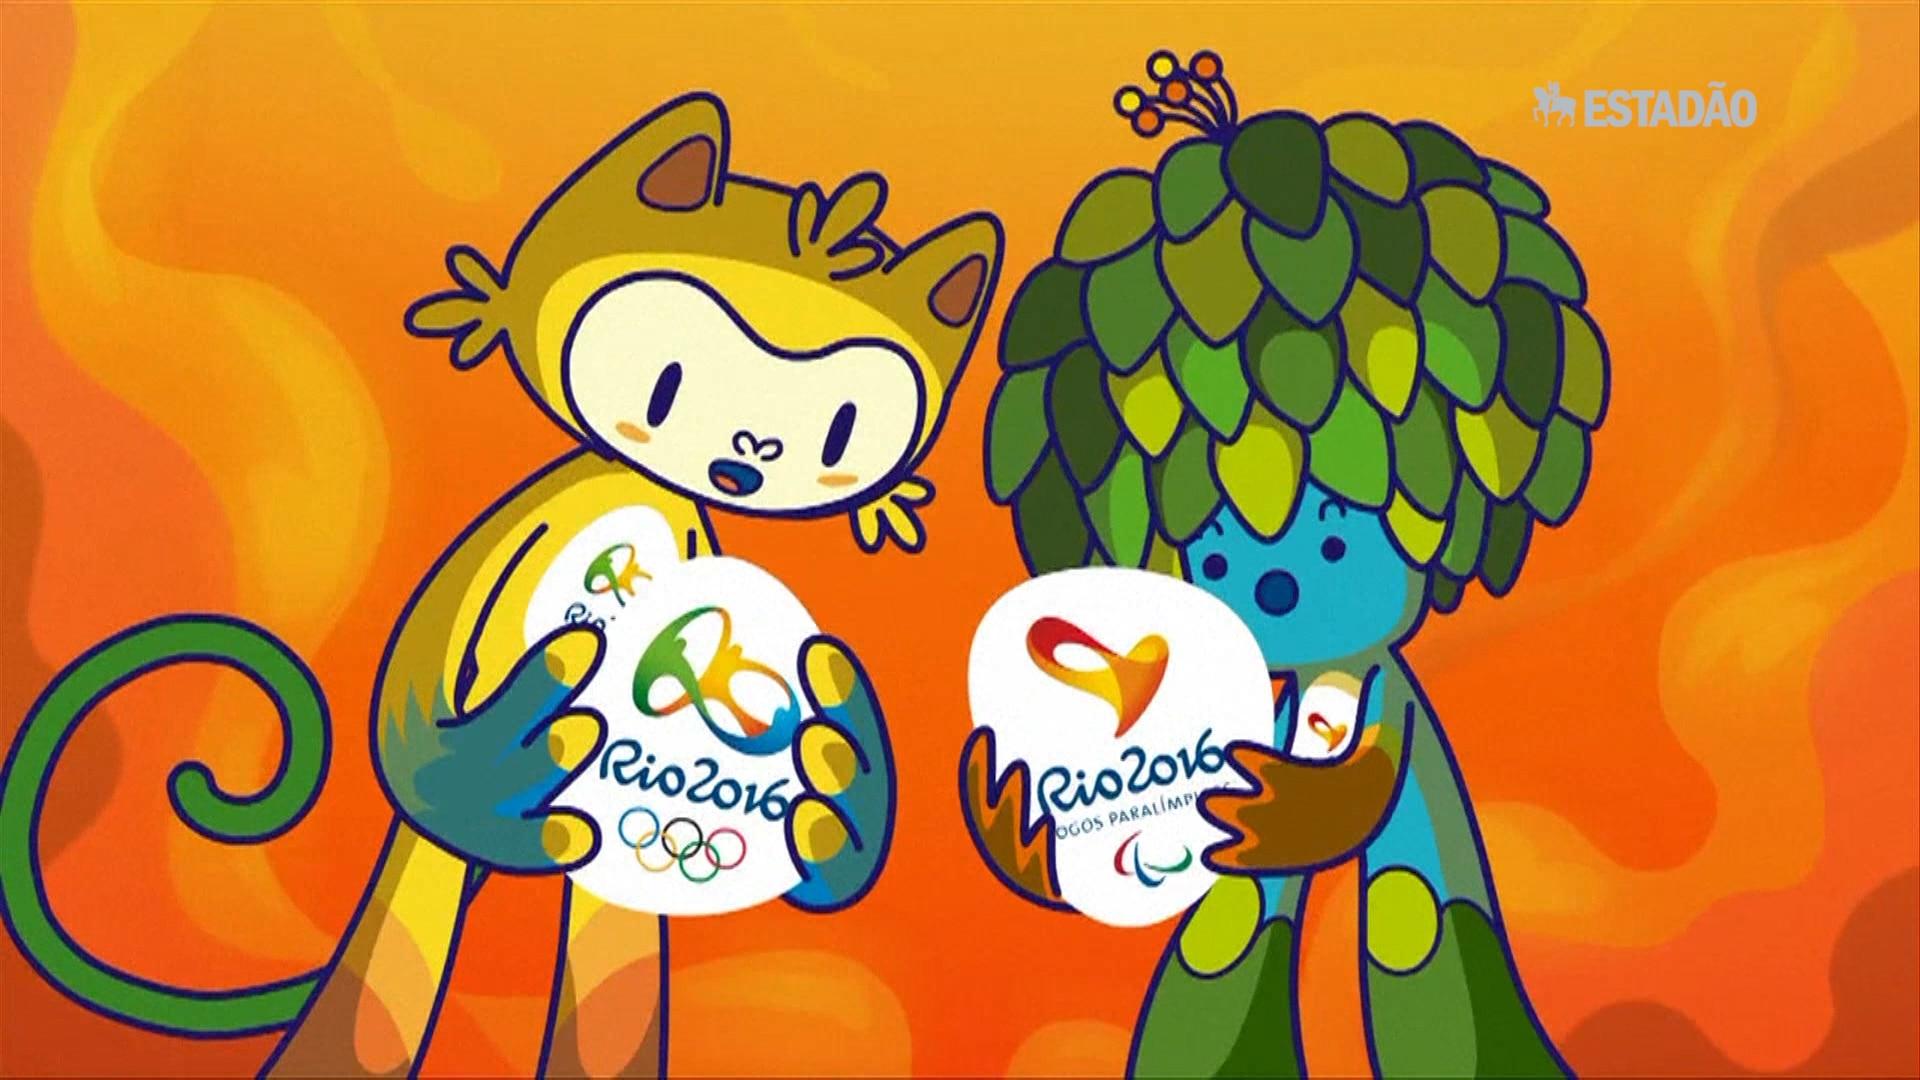 Retrospectiva 2015: Rio se prepara para as Olimpíadas